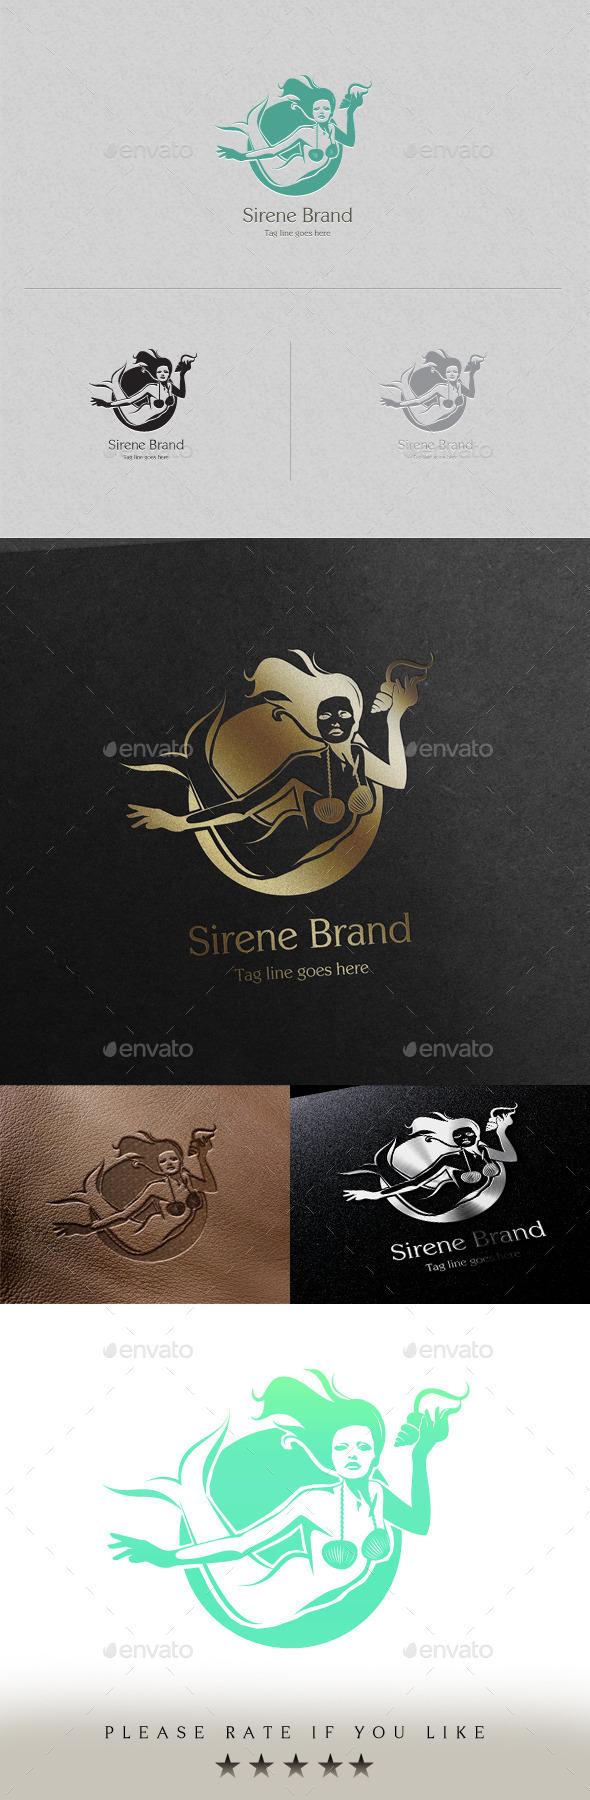 GraphicRiver Sirene Brand Logo Template 11370415